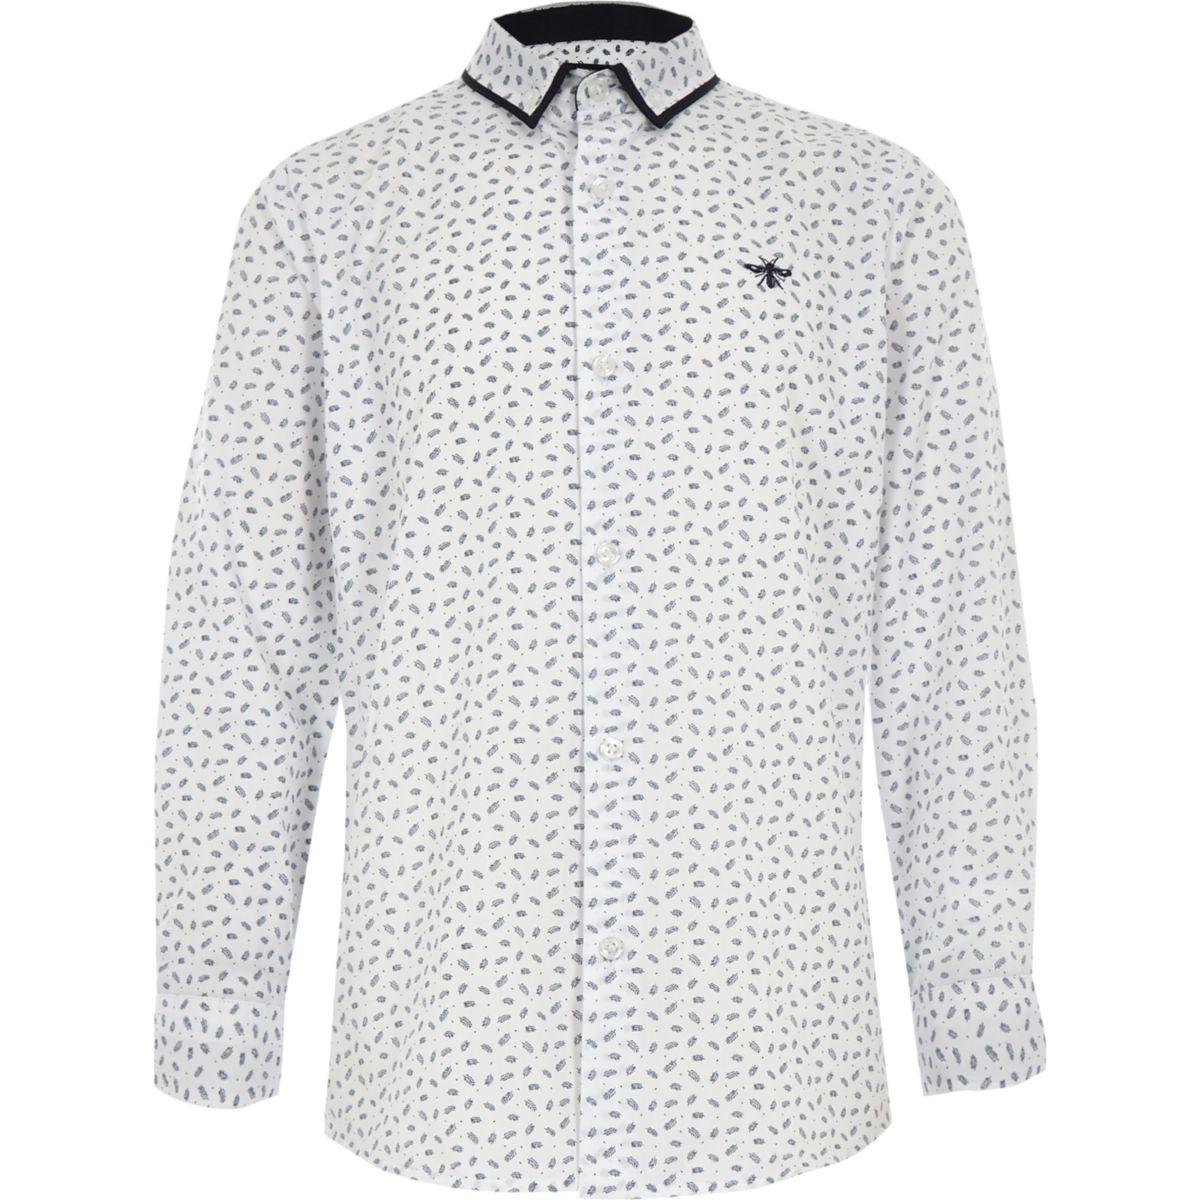 Boys white long sleeve feather print shirt